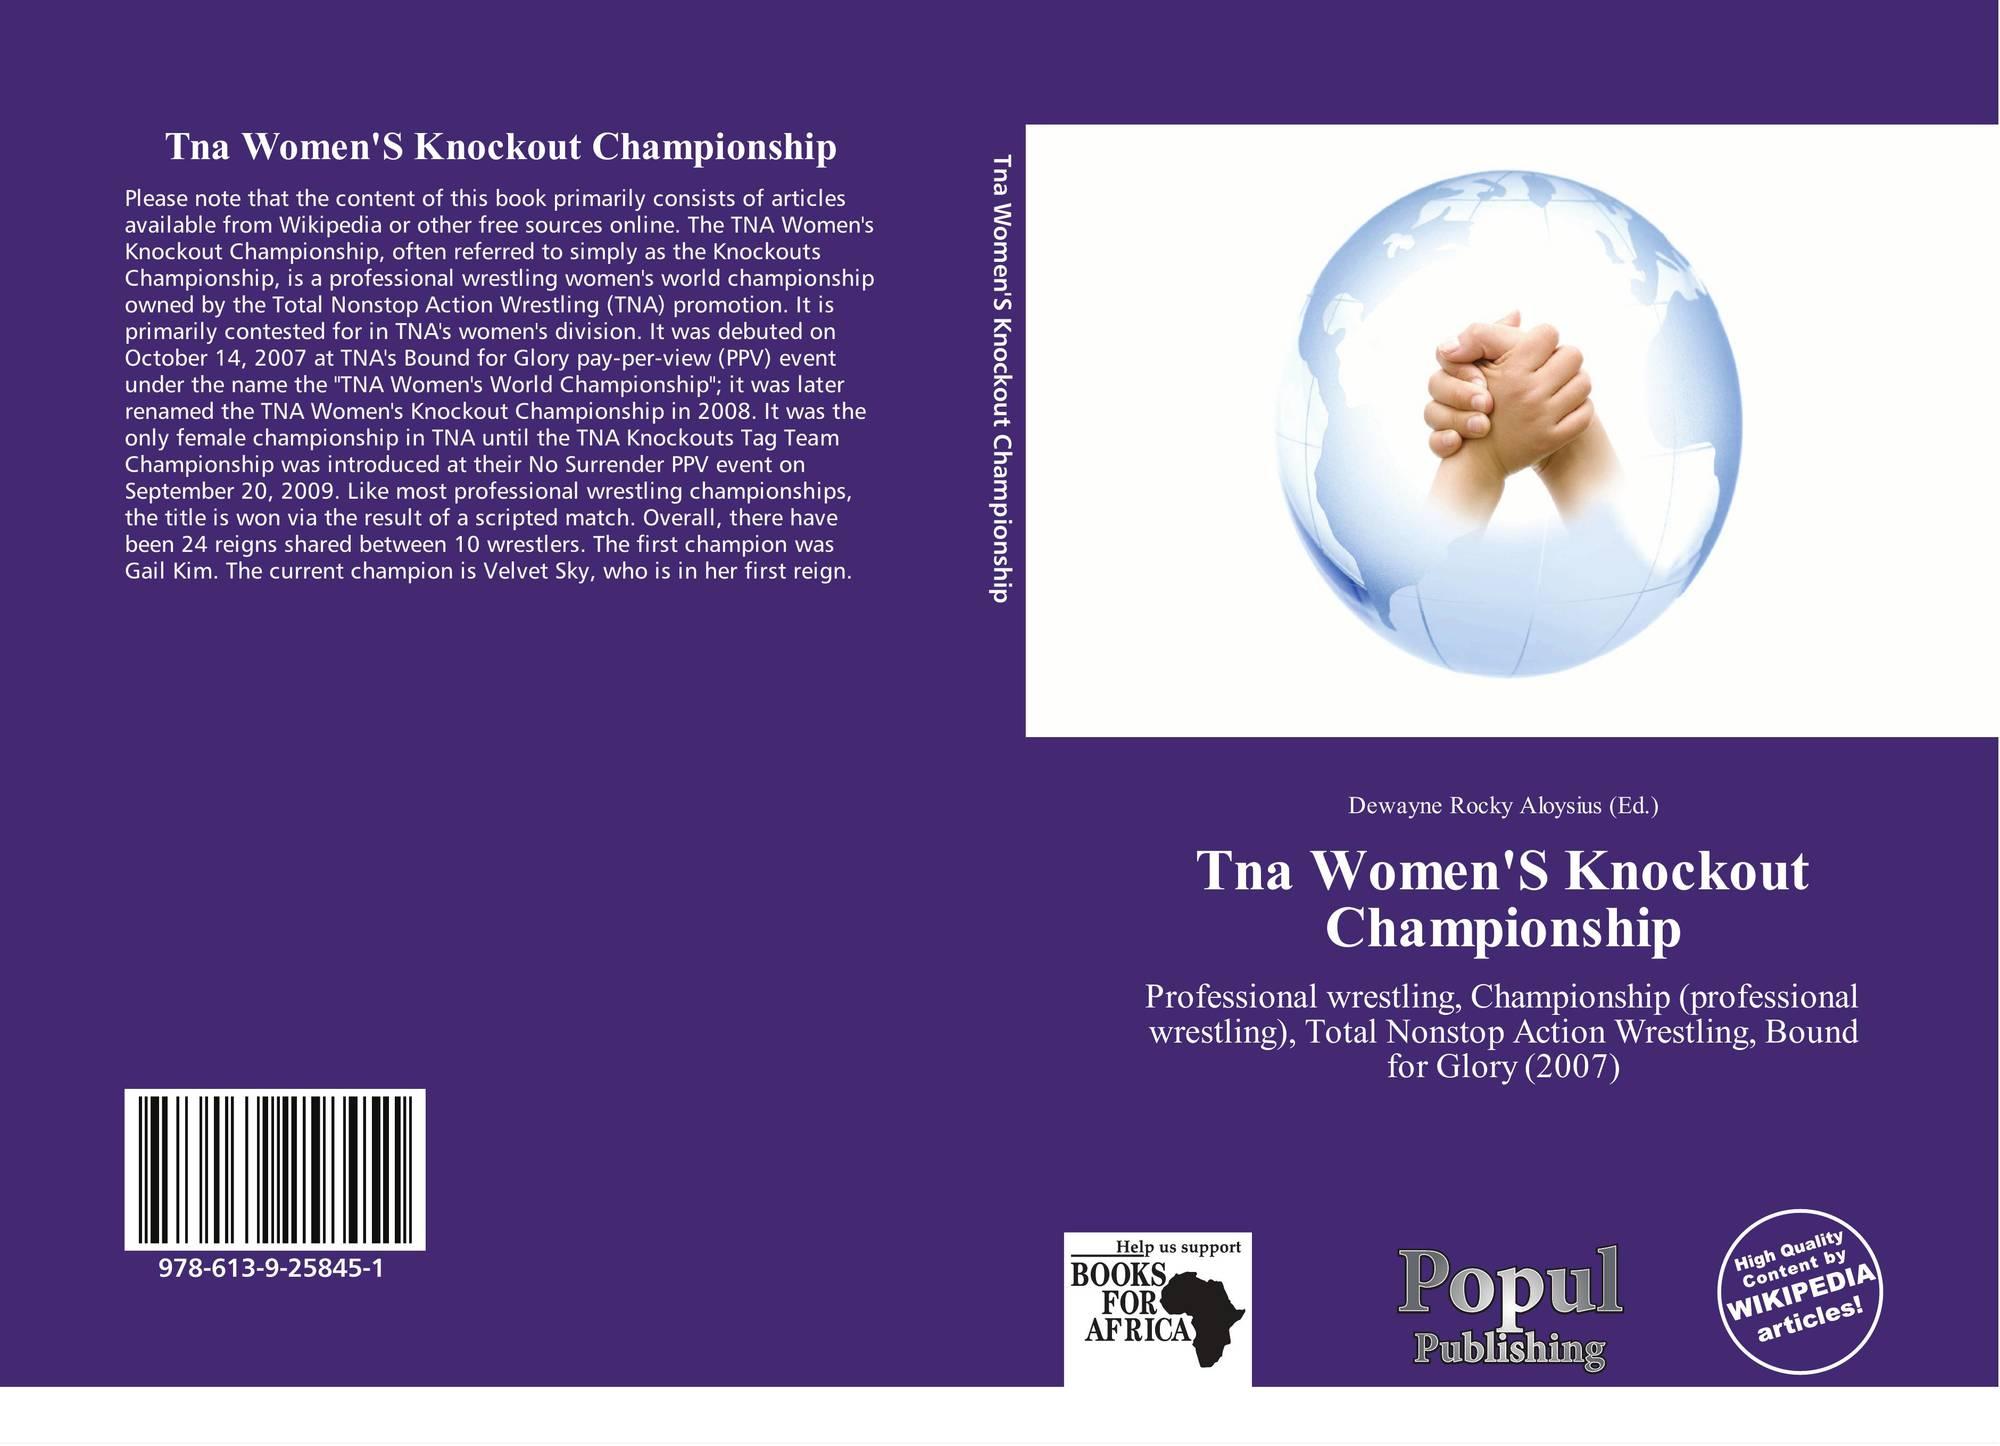 Tna Women'S Knockout Championship, 978-613-9-25845-1